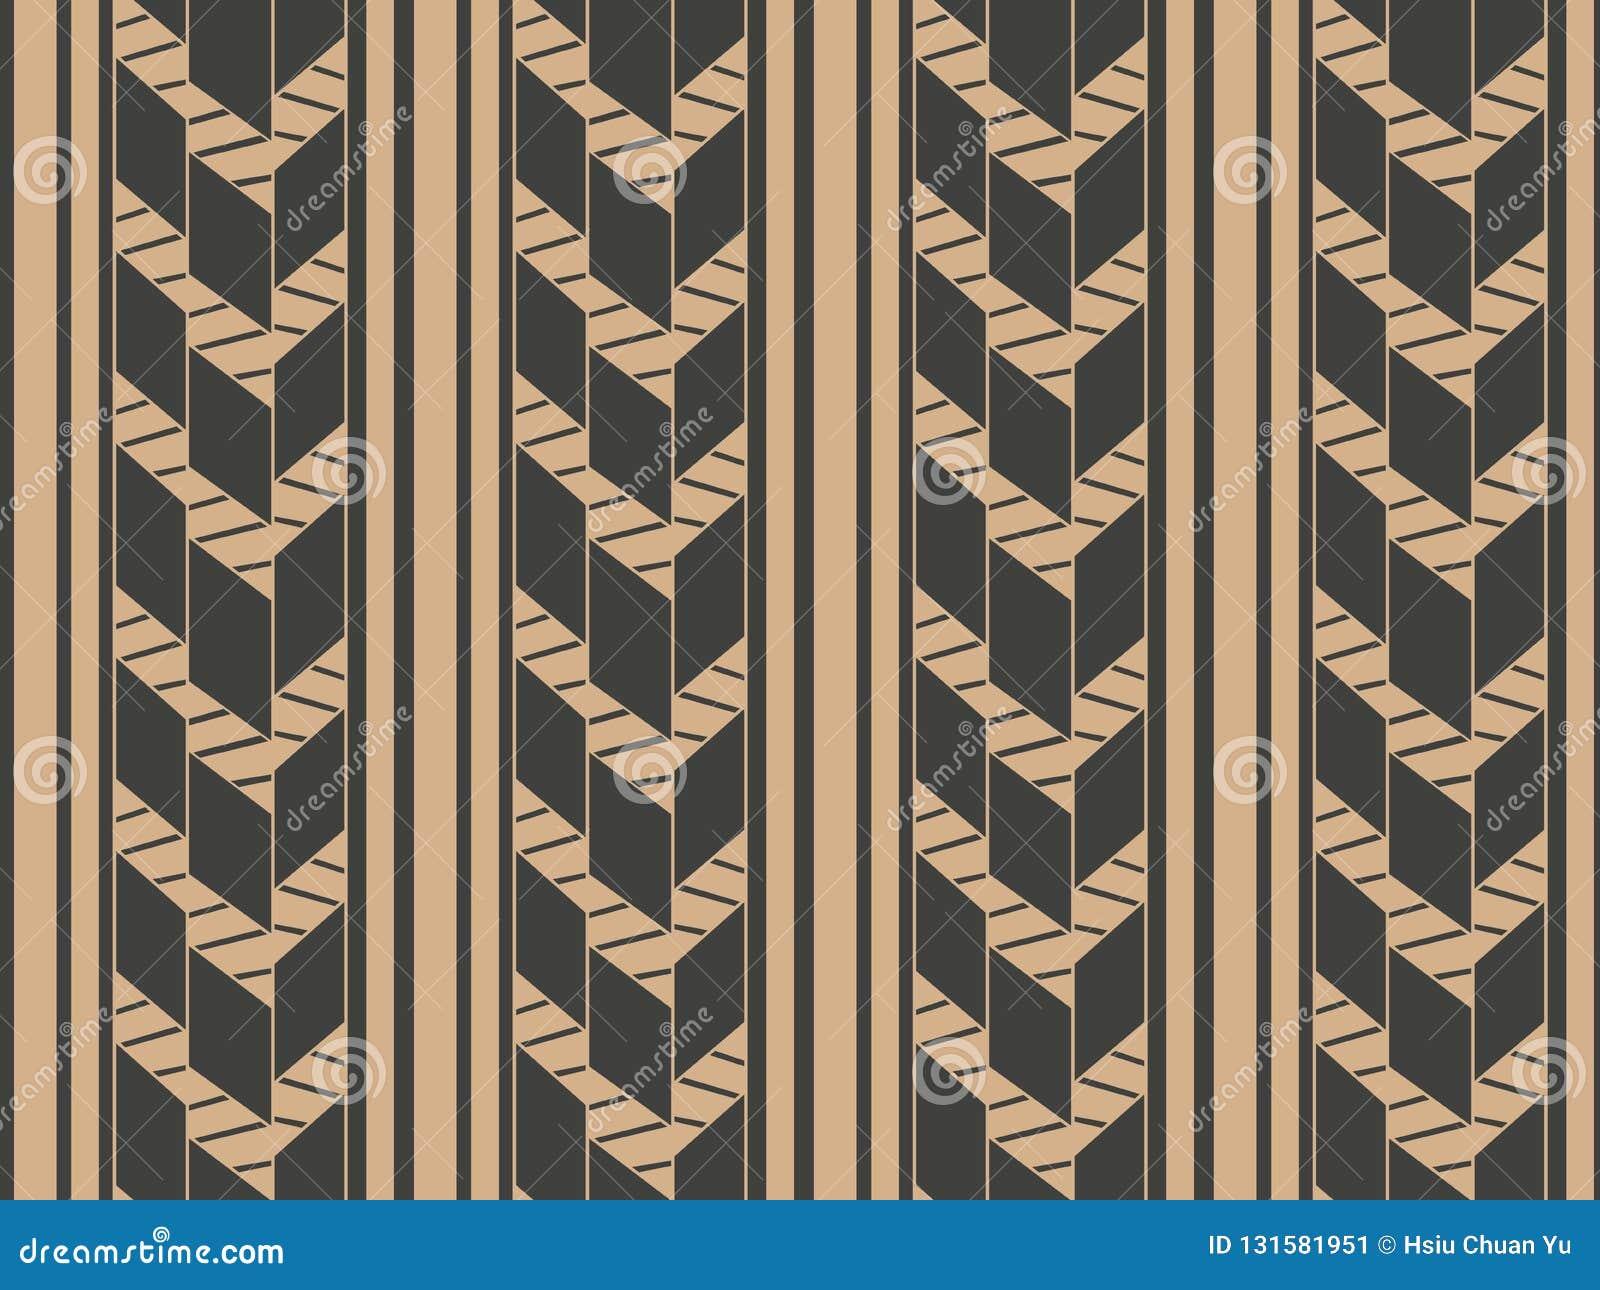 Vector damask seamless retro pattern background geometry cross frame line. Elegant luxury brown tone design for wallpapers,